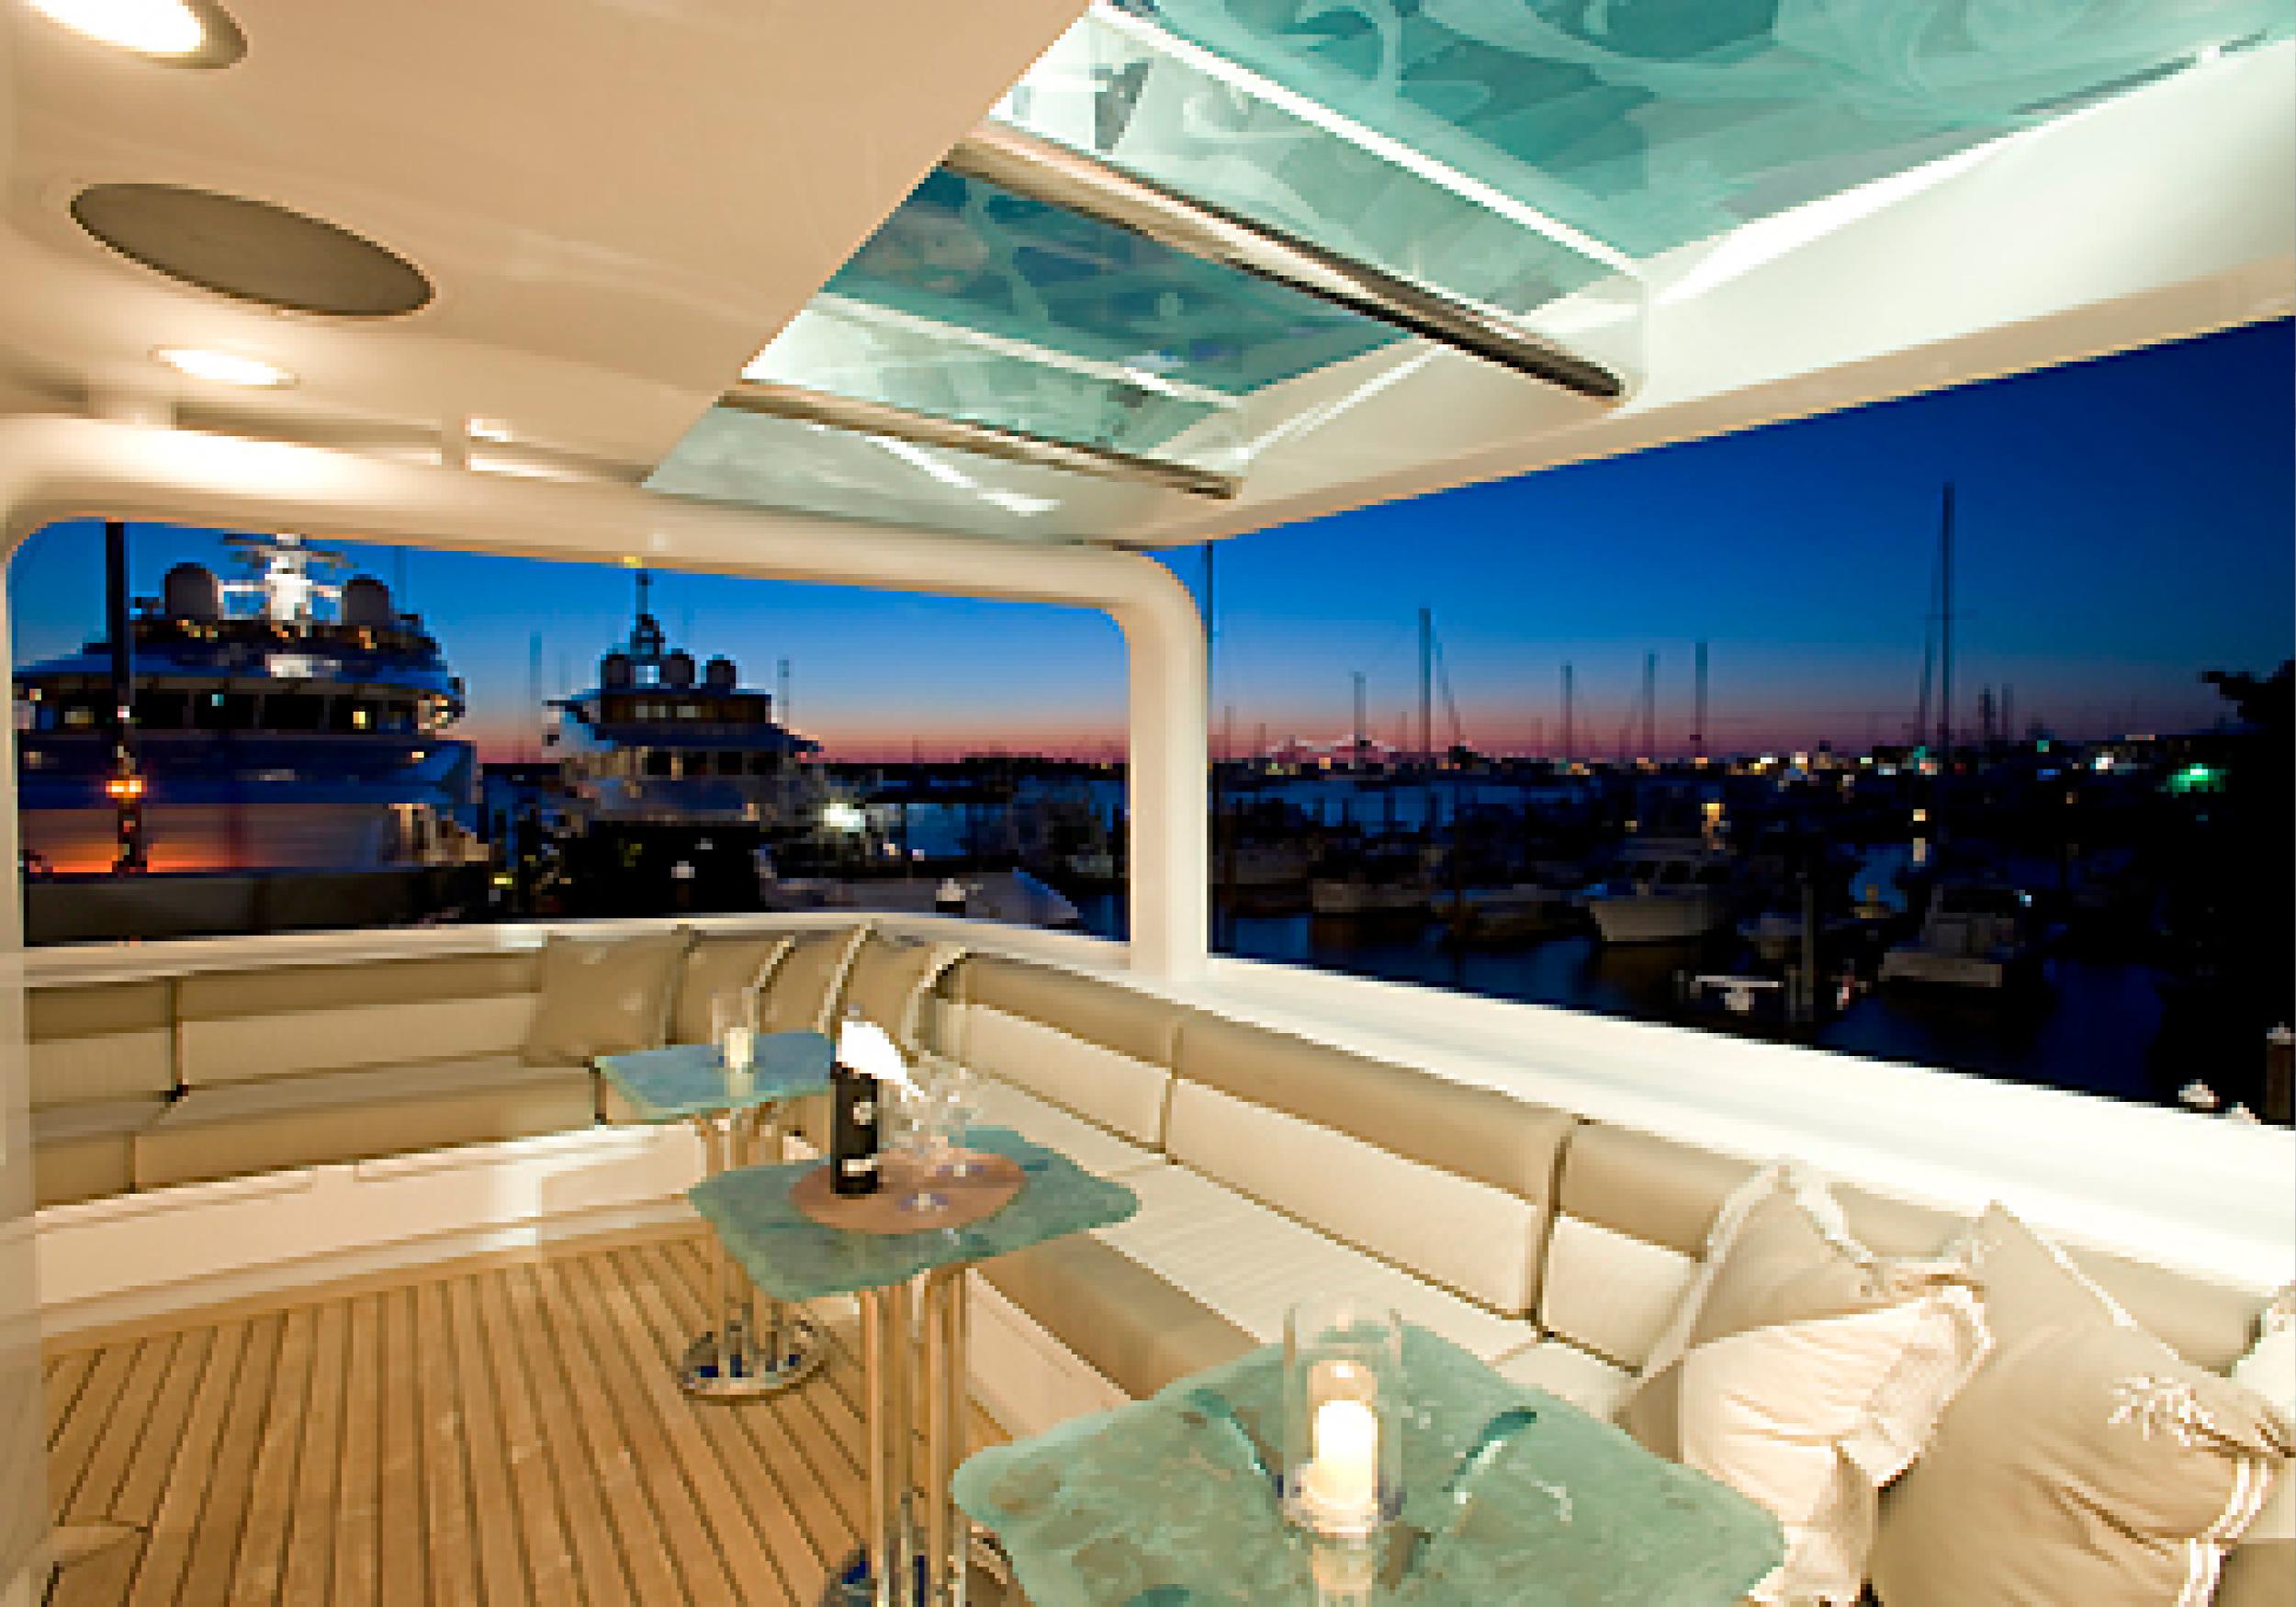 Karen-Lynn-Interior-Design-Yacht-Tooth-Fairy-17.jpg